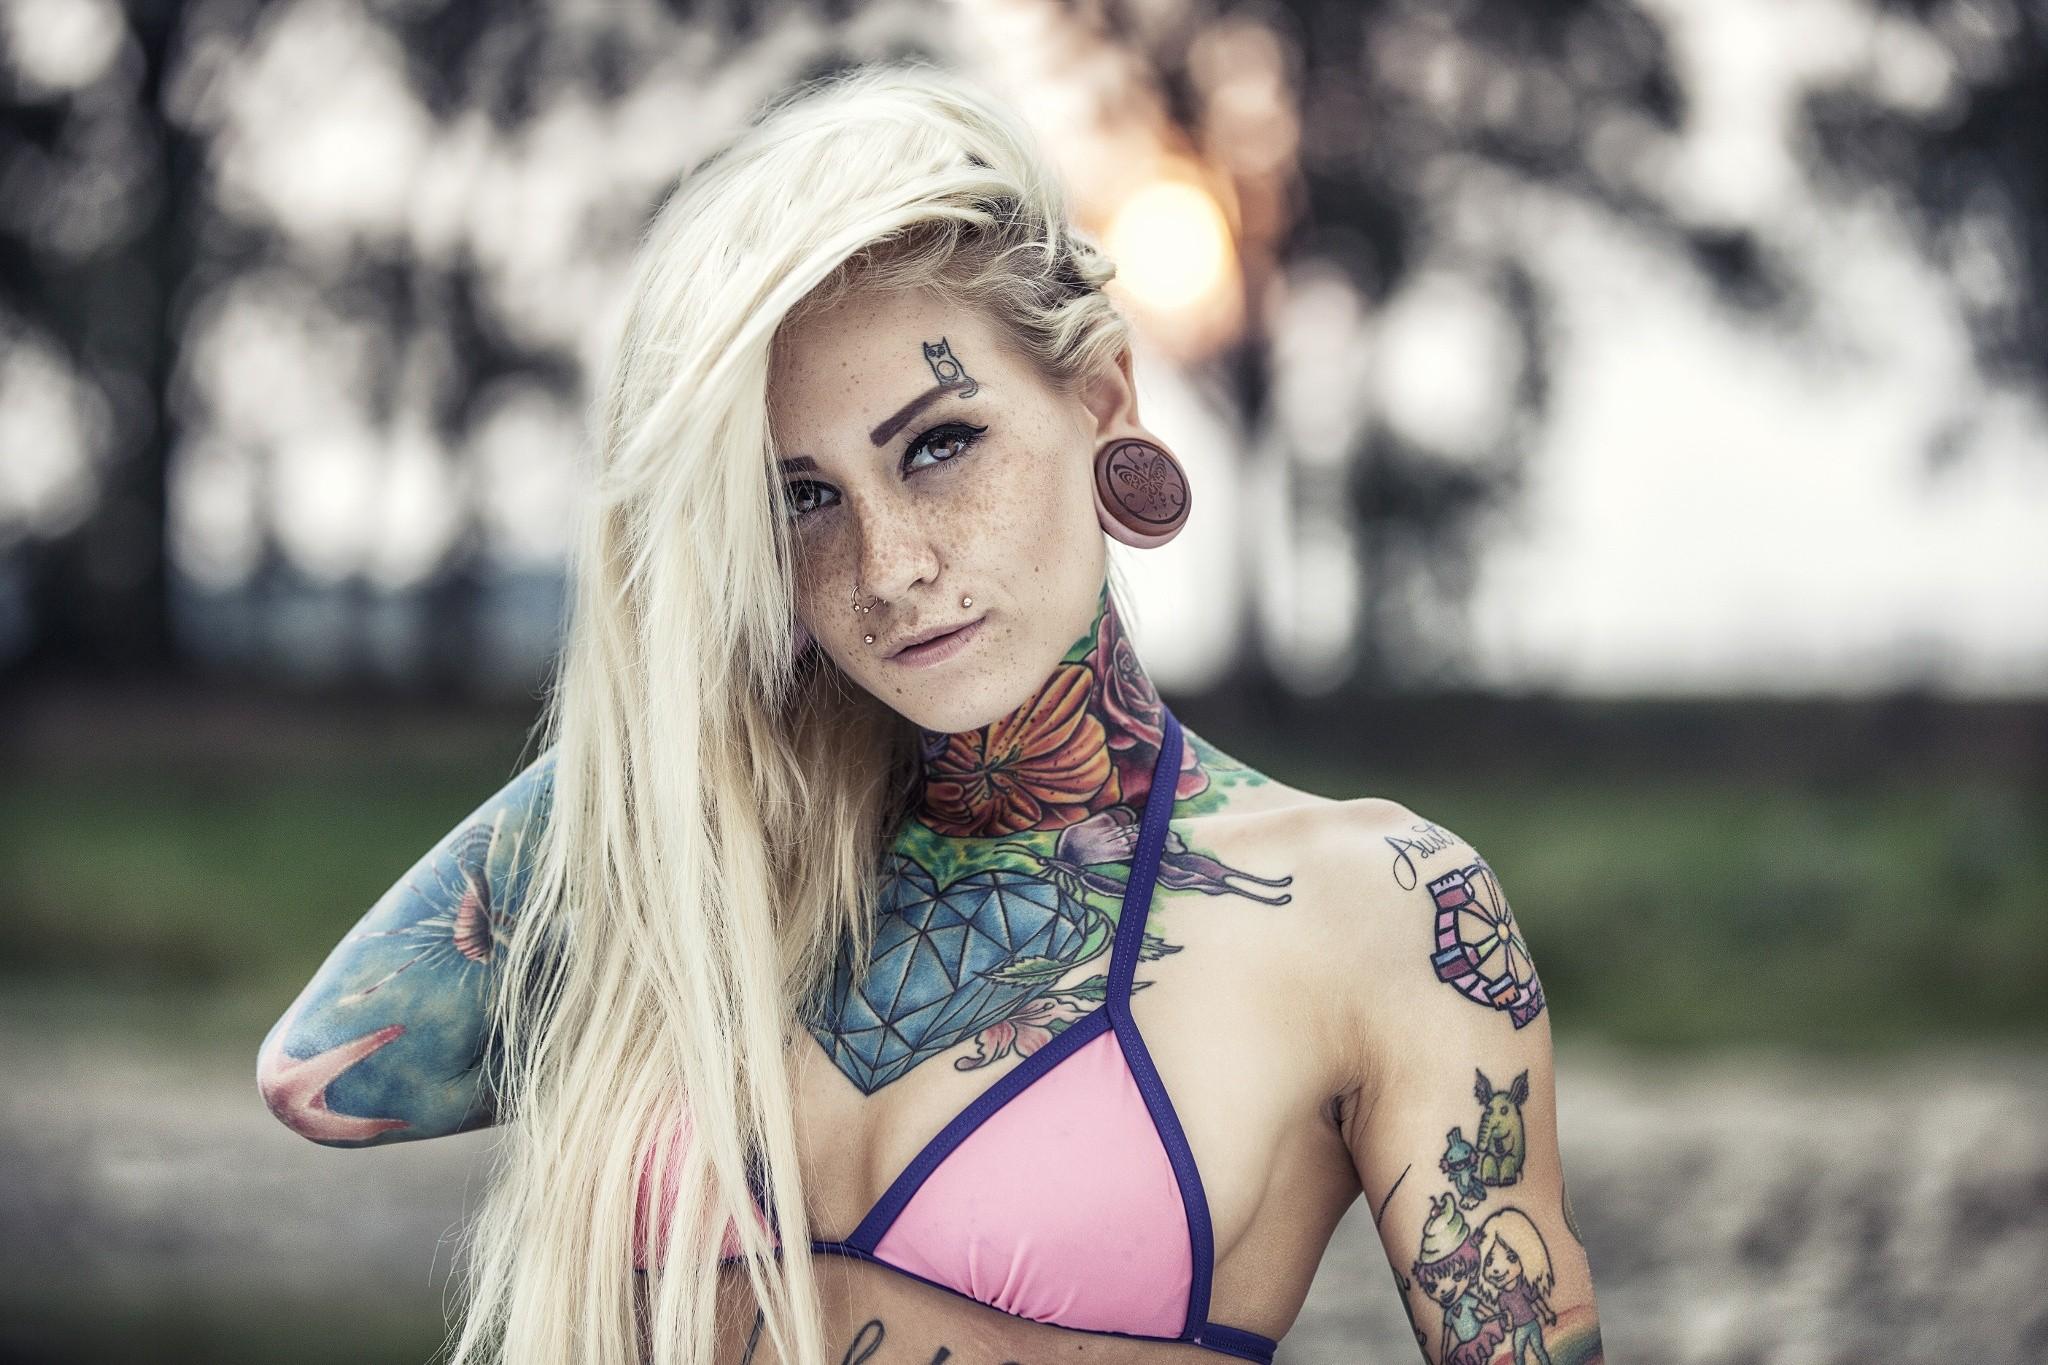 Ice lafoxx big boobs